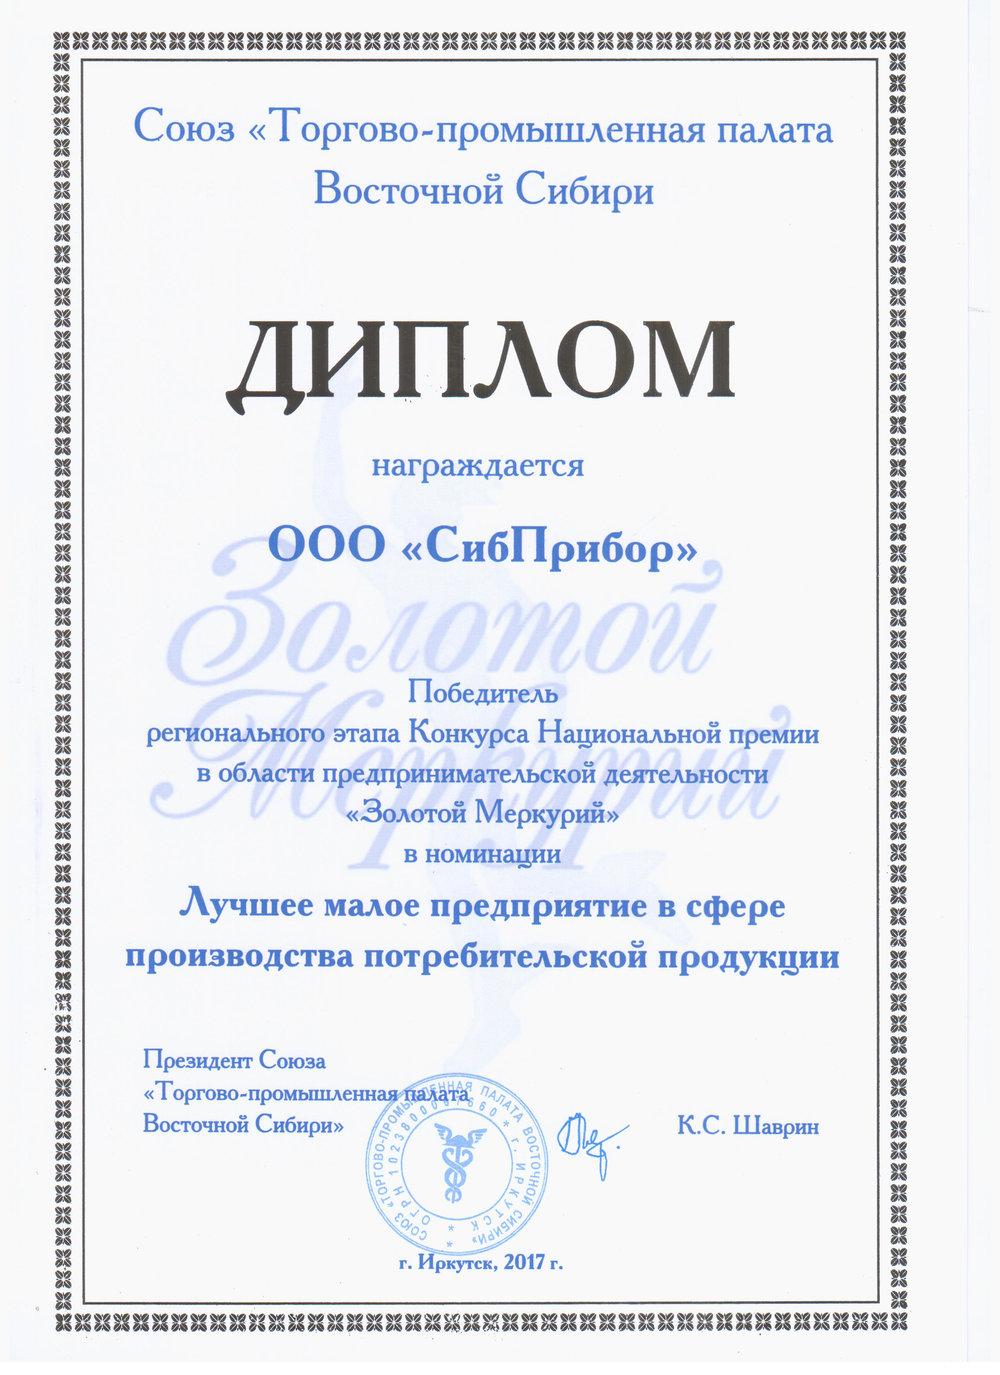 Диплом Золотой Меркурий.jpg